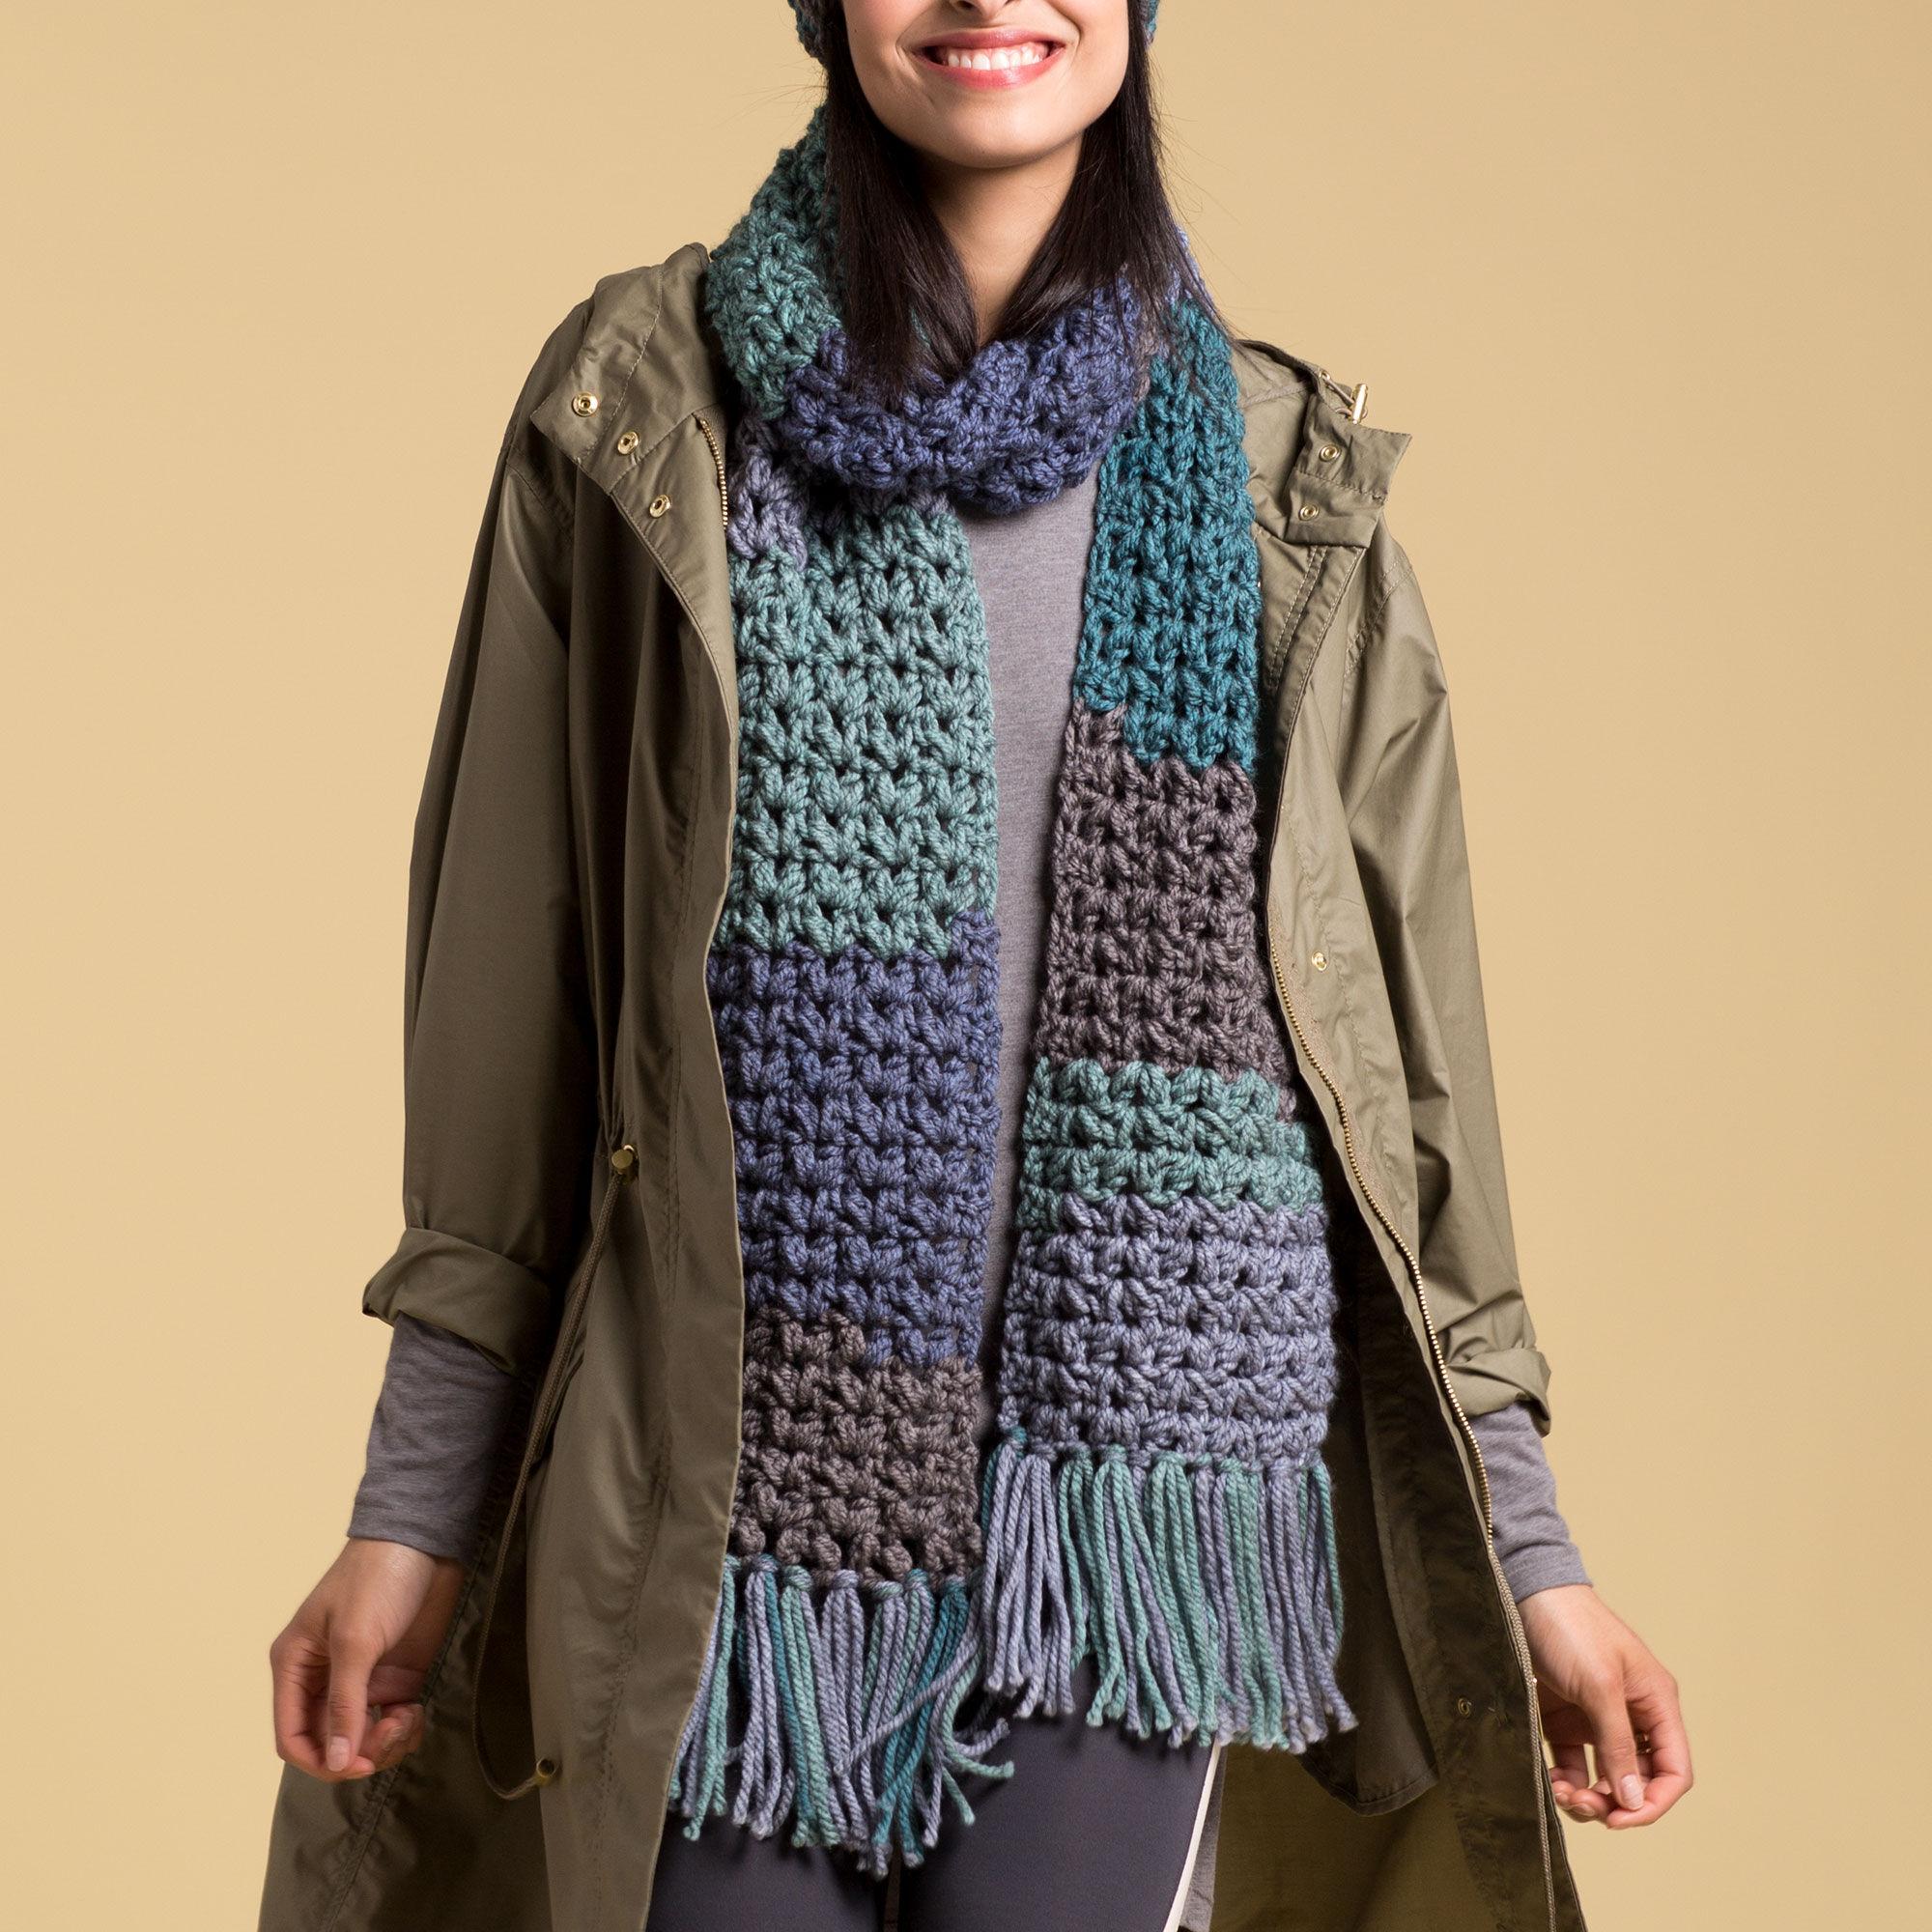 Caron Crochet Winter Scarf Pattern Yarnspirations